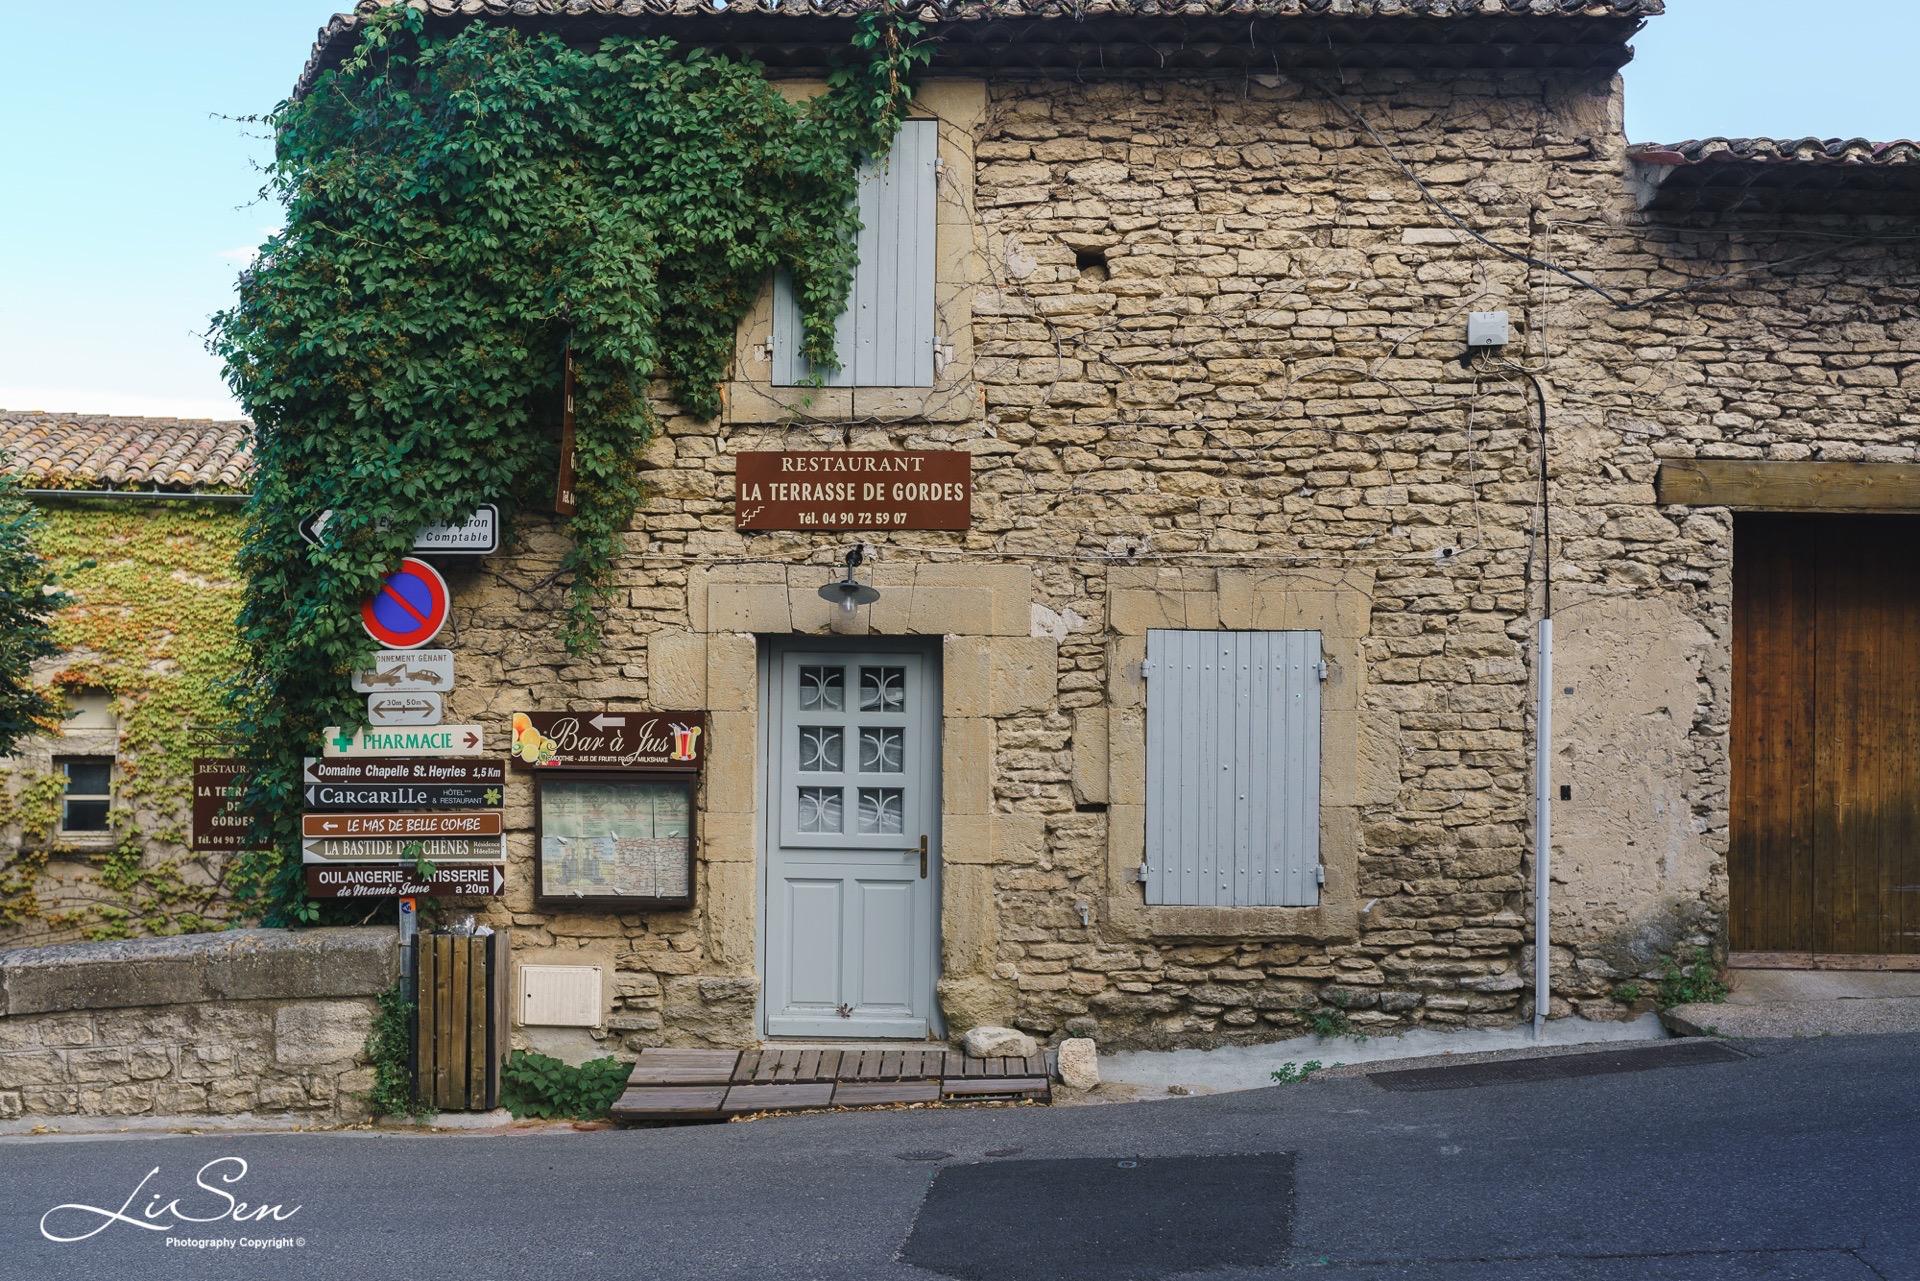 Gordes Travel Guides 2020 Gordes Attractions Map Vaucluse